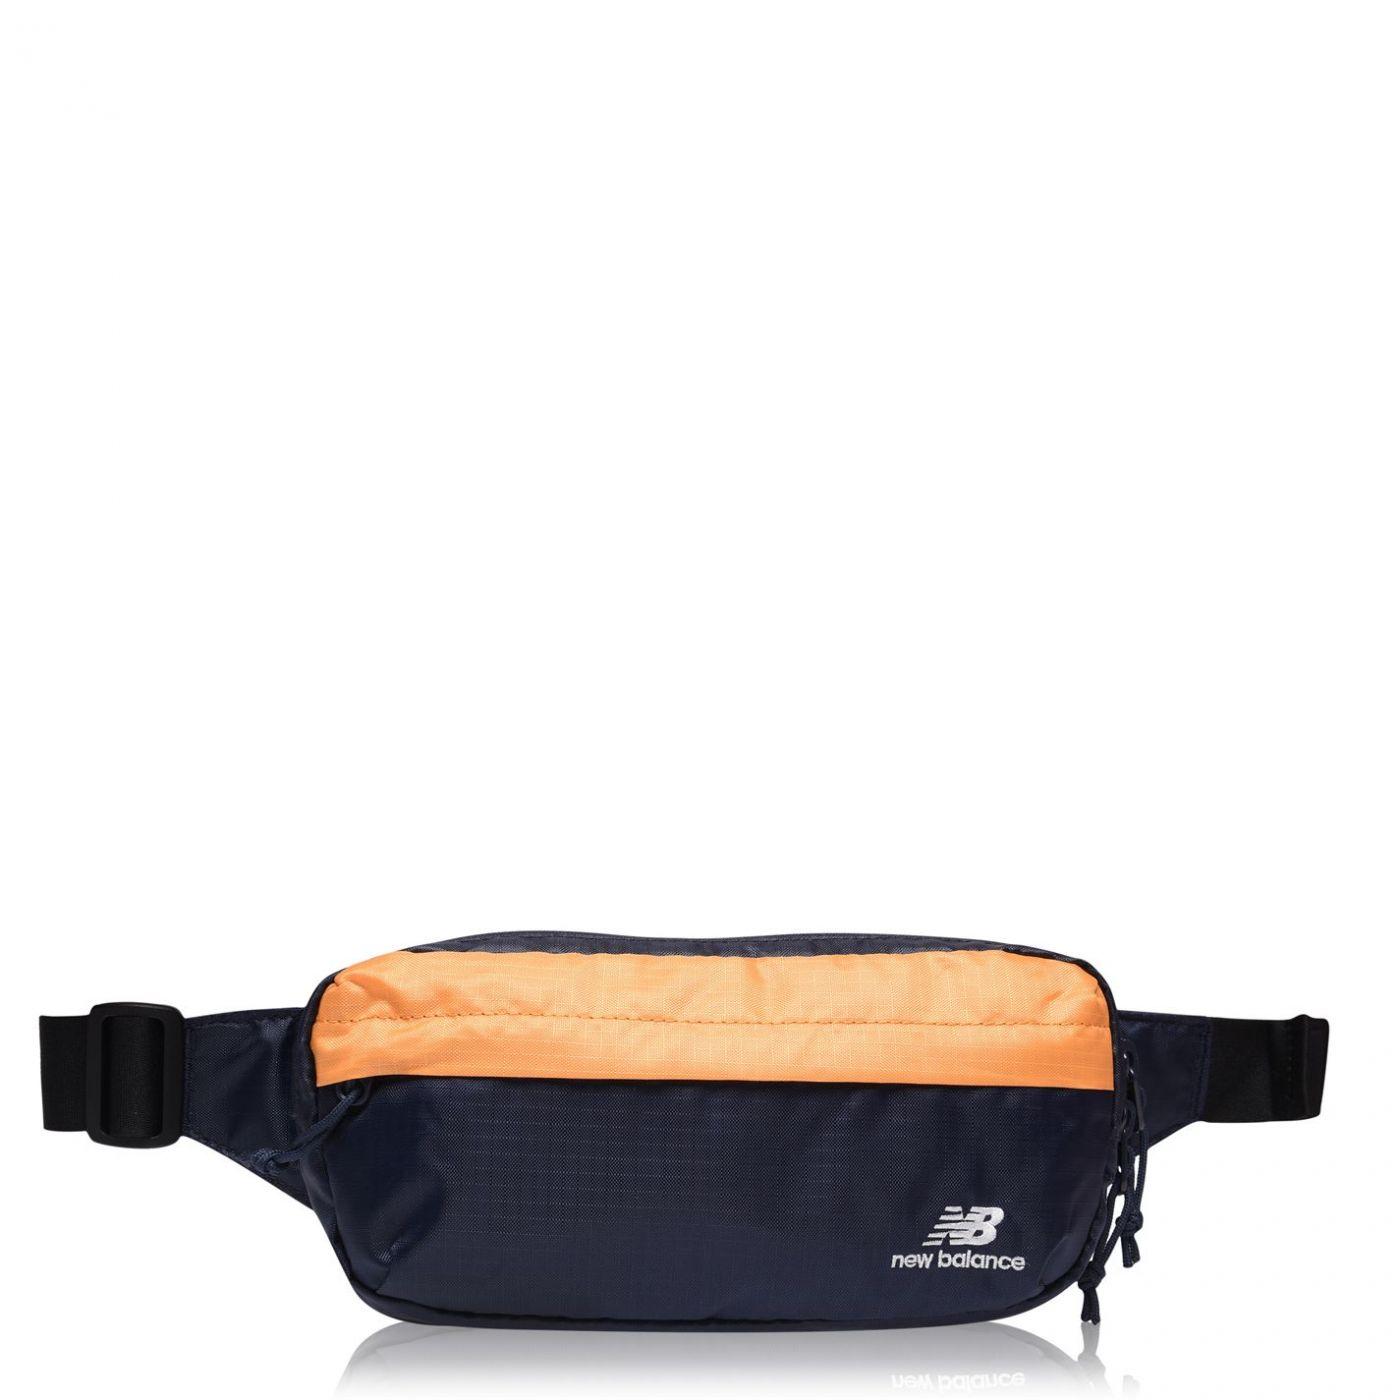 New Balance Nylon Bum Bag